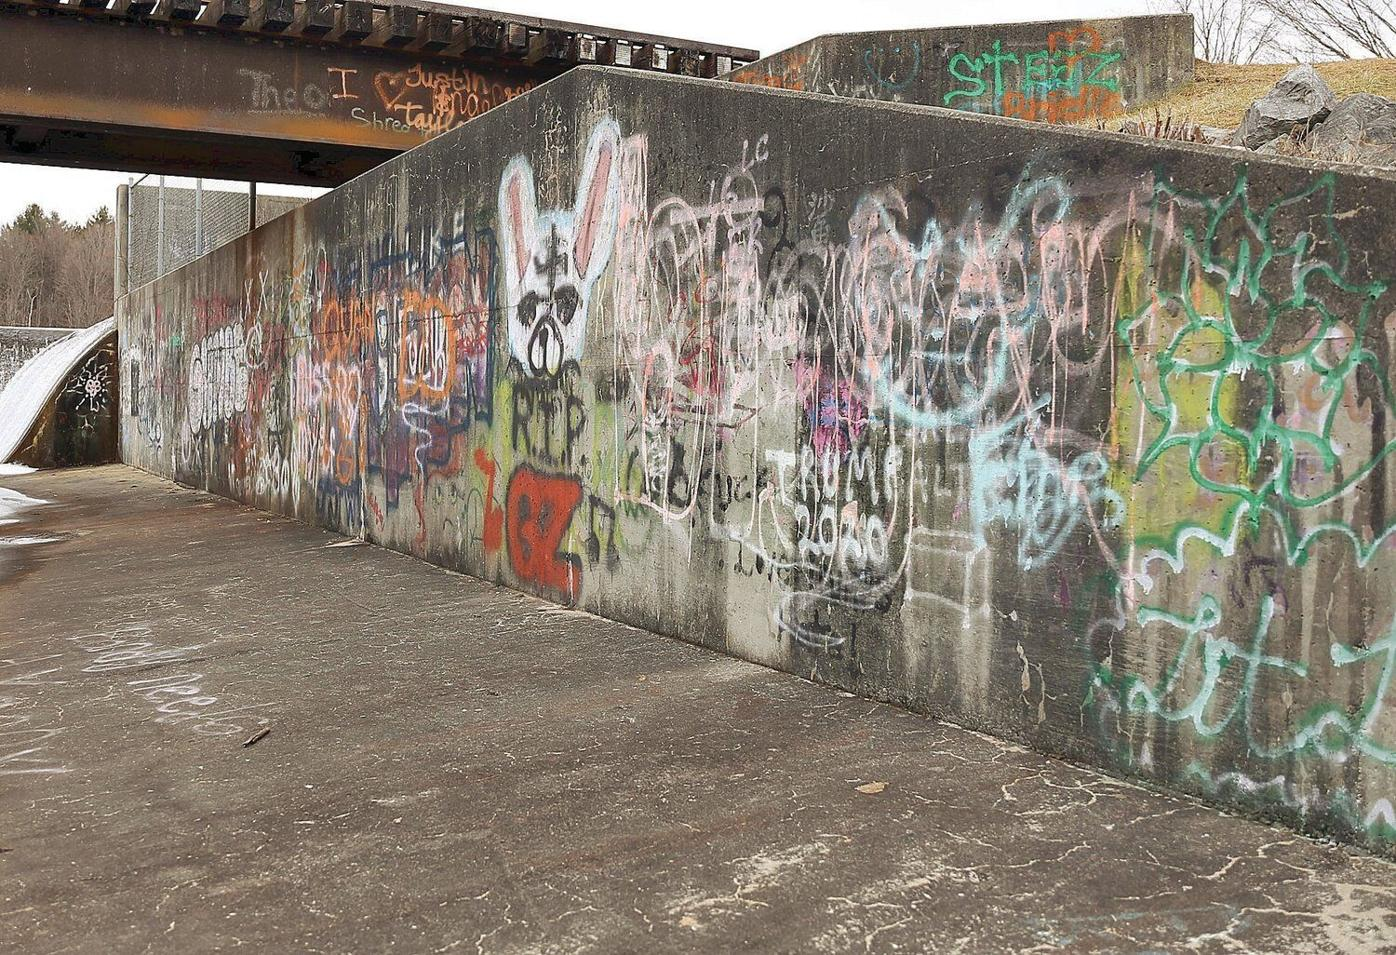 Police seek information about racist graffiti at Lake Paran